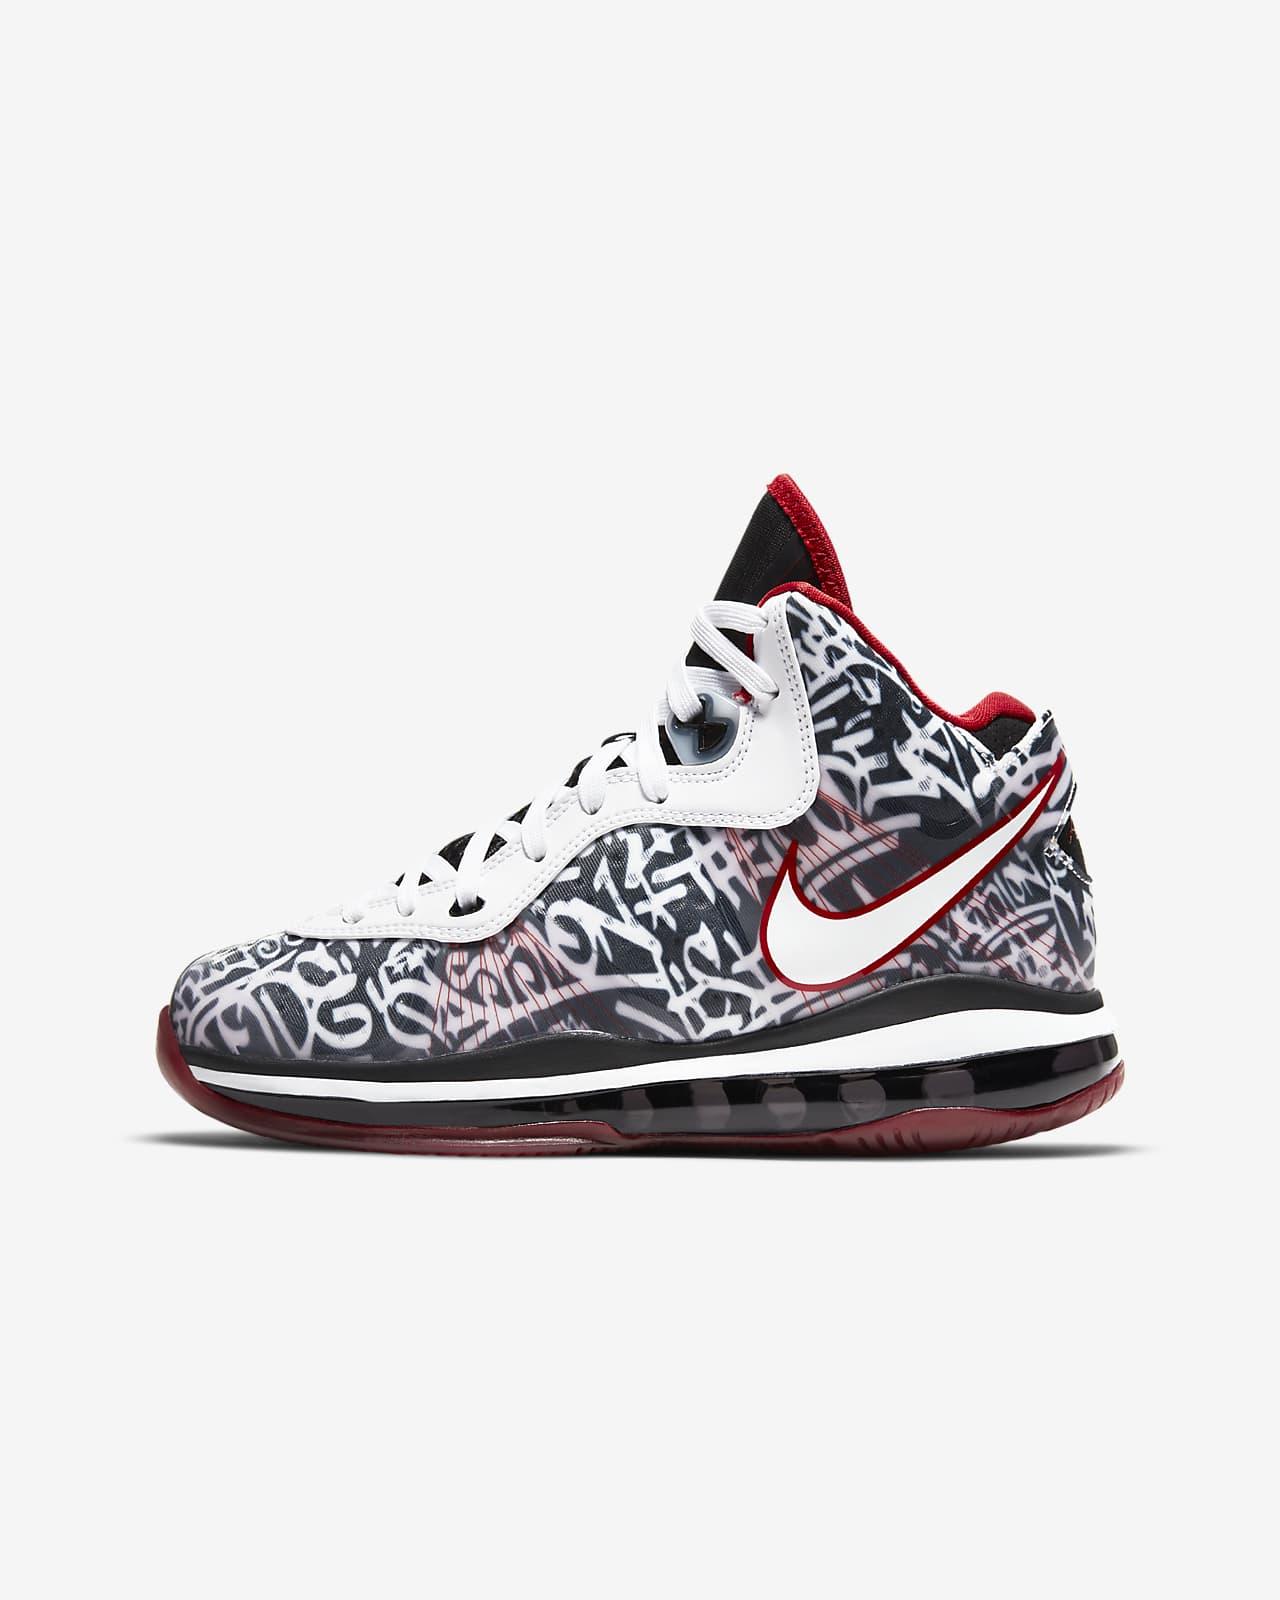 Nike LeBron 8 Older Kids' Shoe